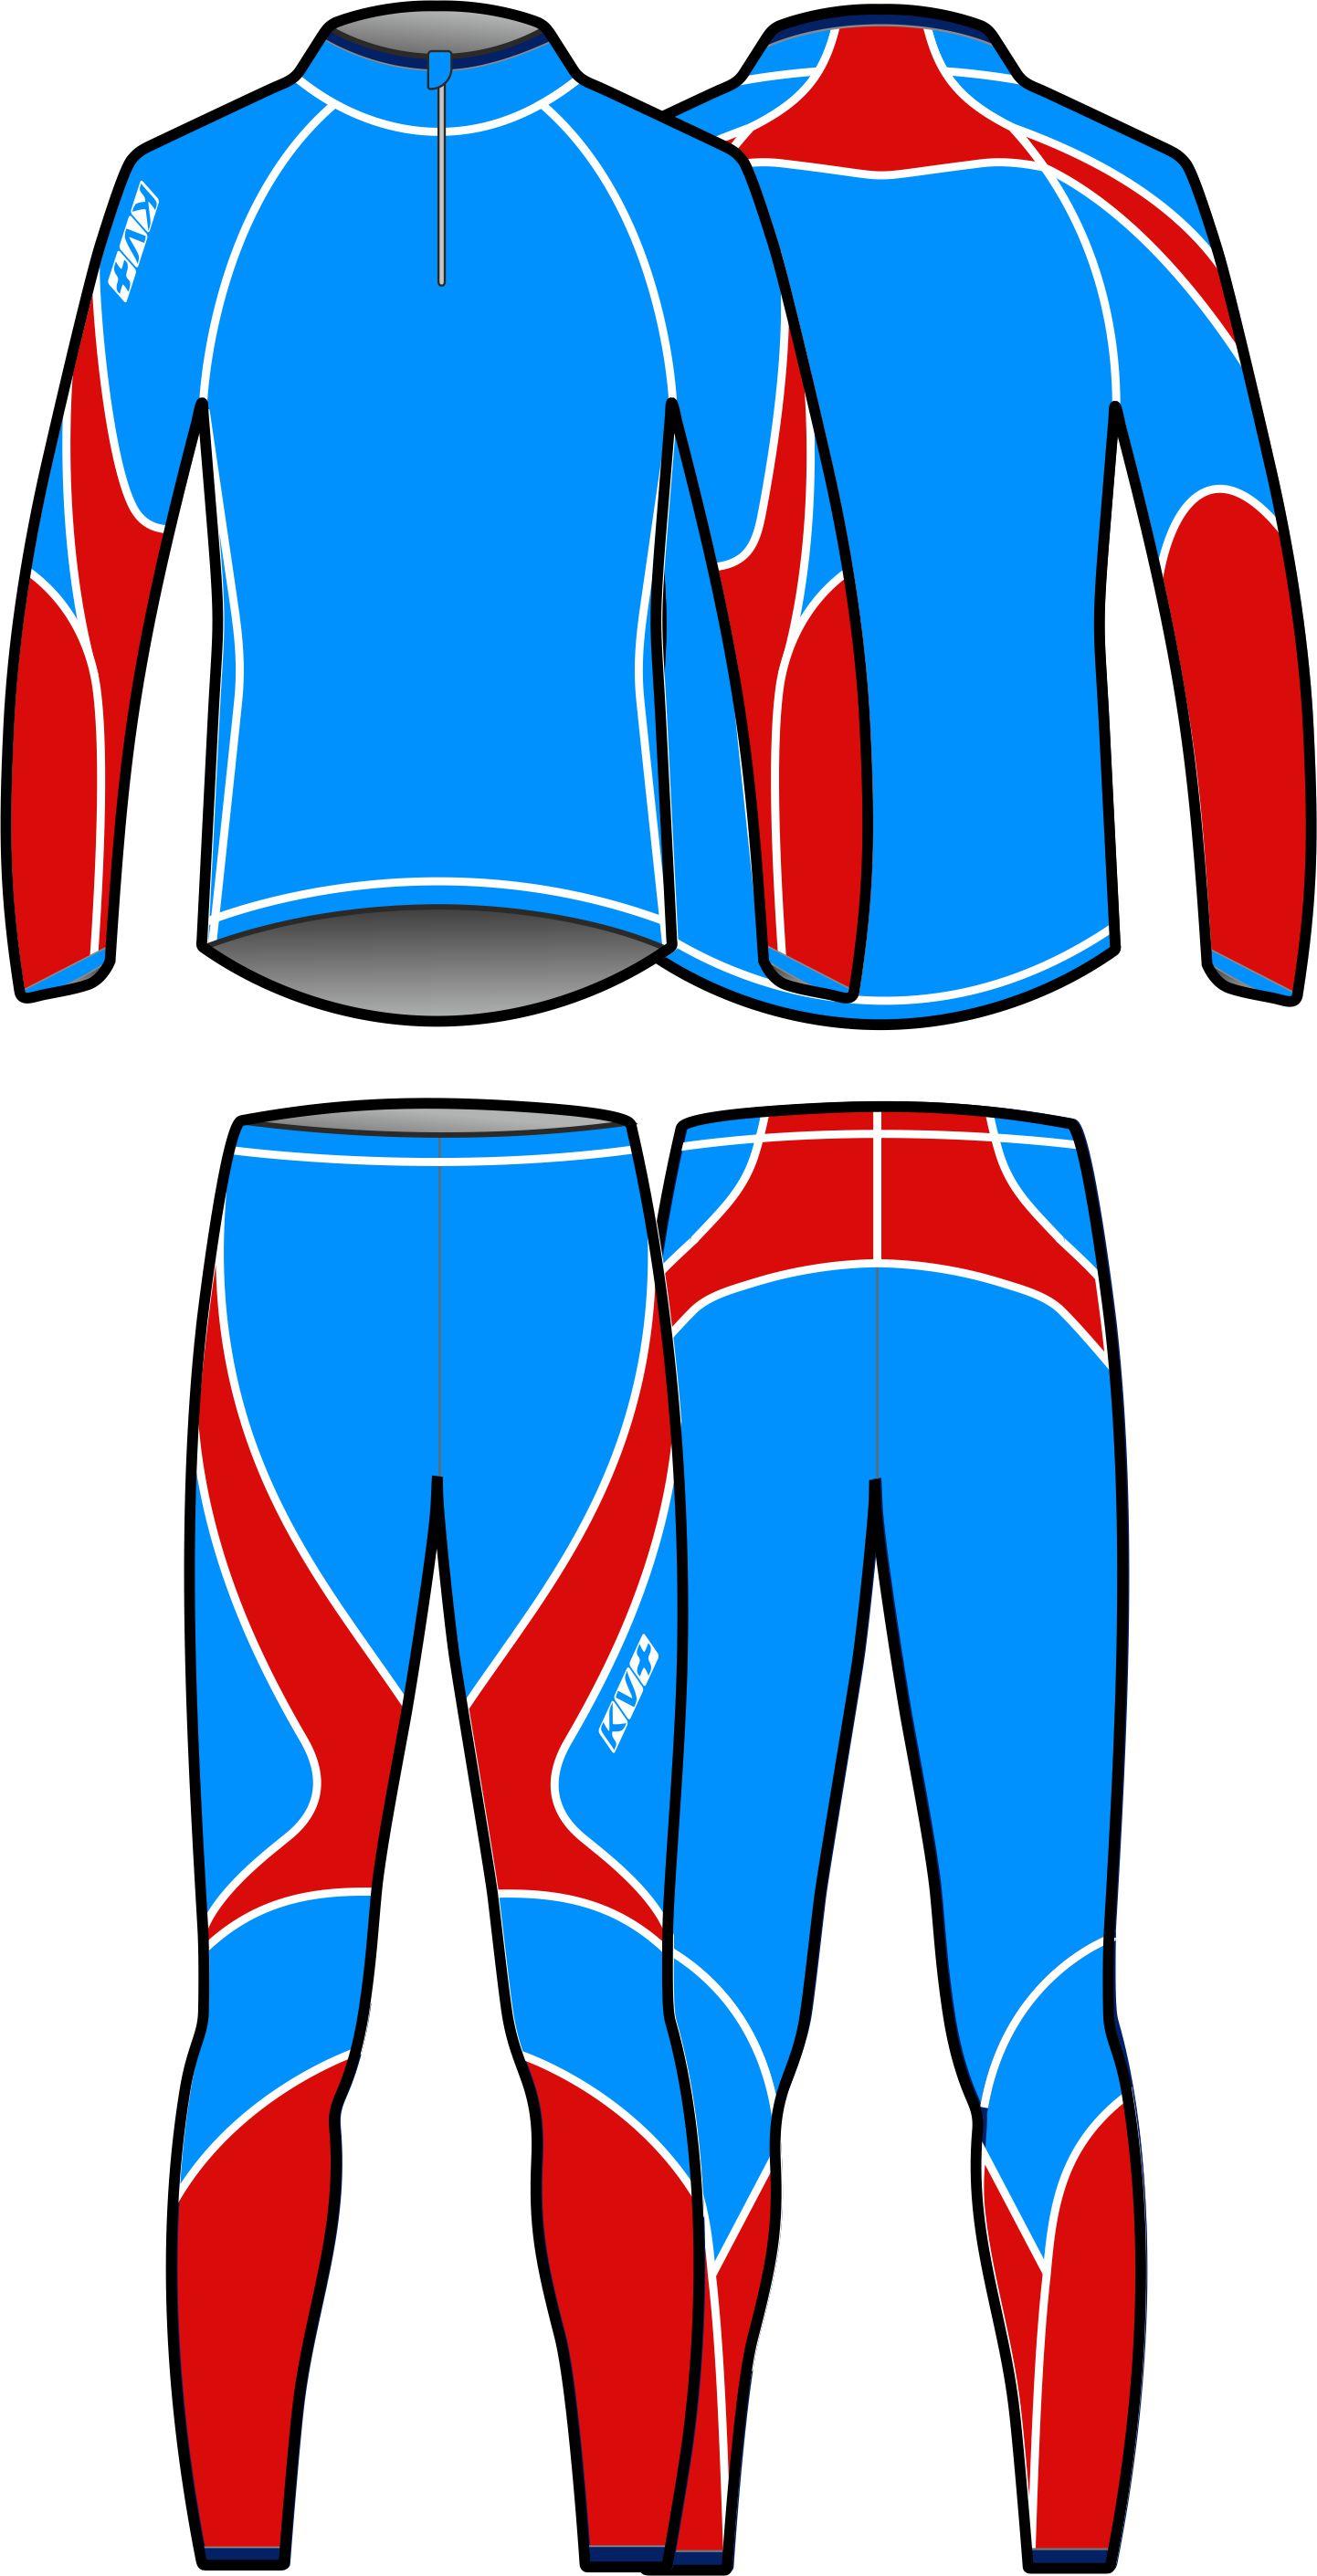 LAHTI TWO PIECES SUIT UNISEX (blue/red)